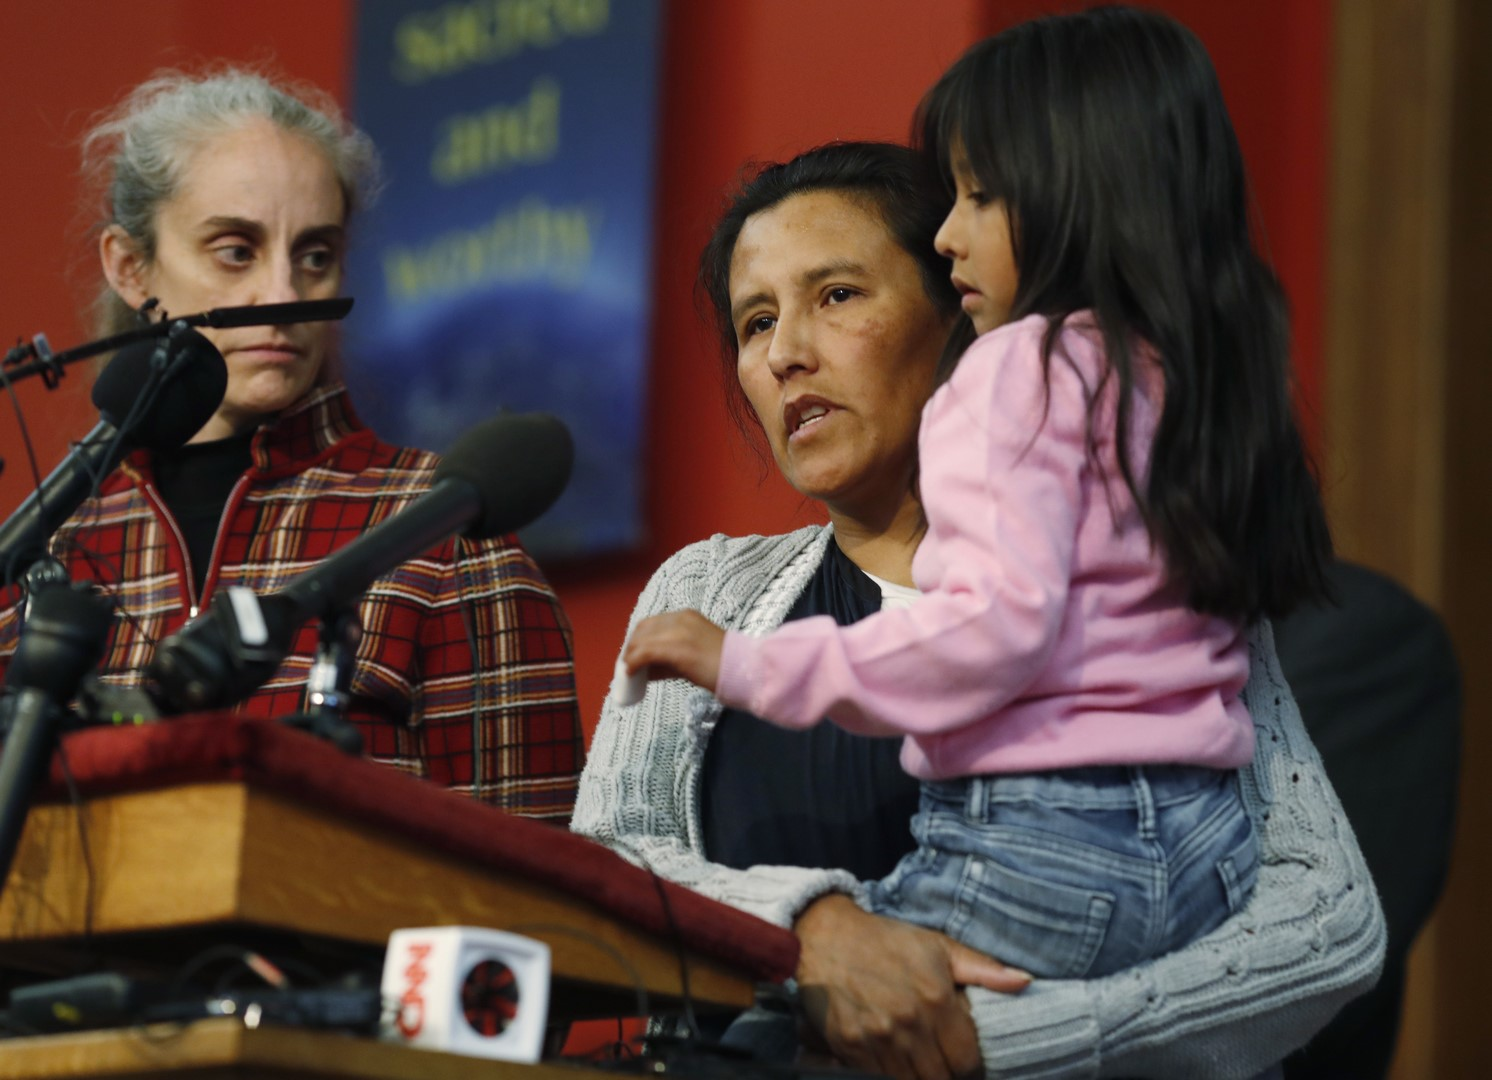 Deja migrante mexicana Jeanette Vizguerra iglesia donde estaba refugiada